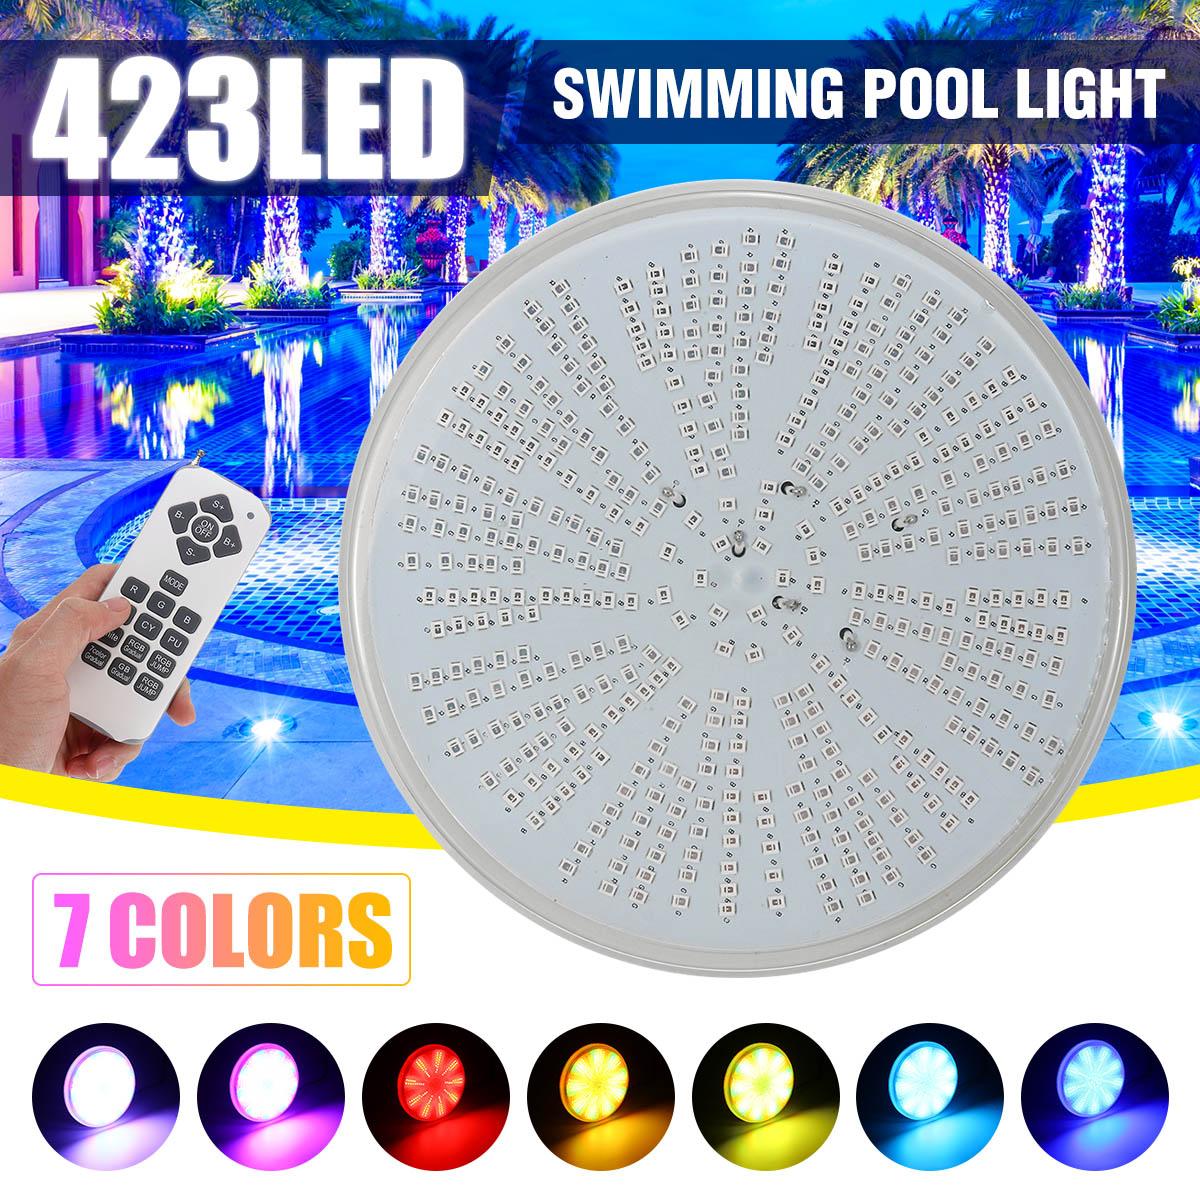 Luz Led para piscina 423leds AC/DC12V RGB resina de repuesto PAR56 lámpara impermeable IP68 Multi Color 2m alambre luces subacuáticas